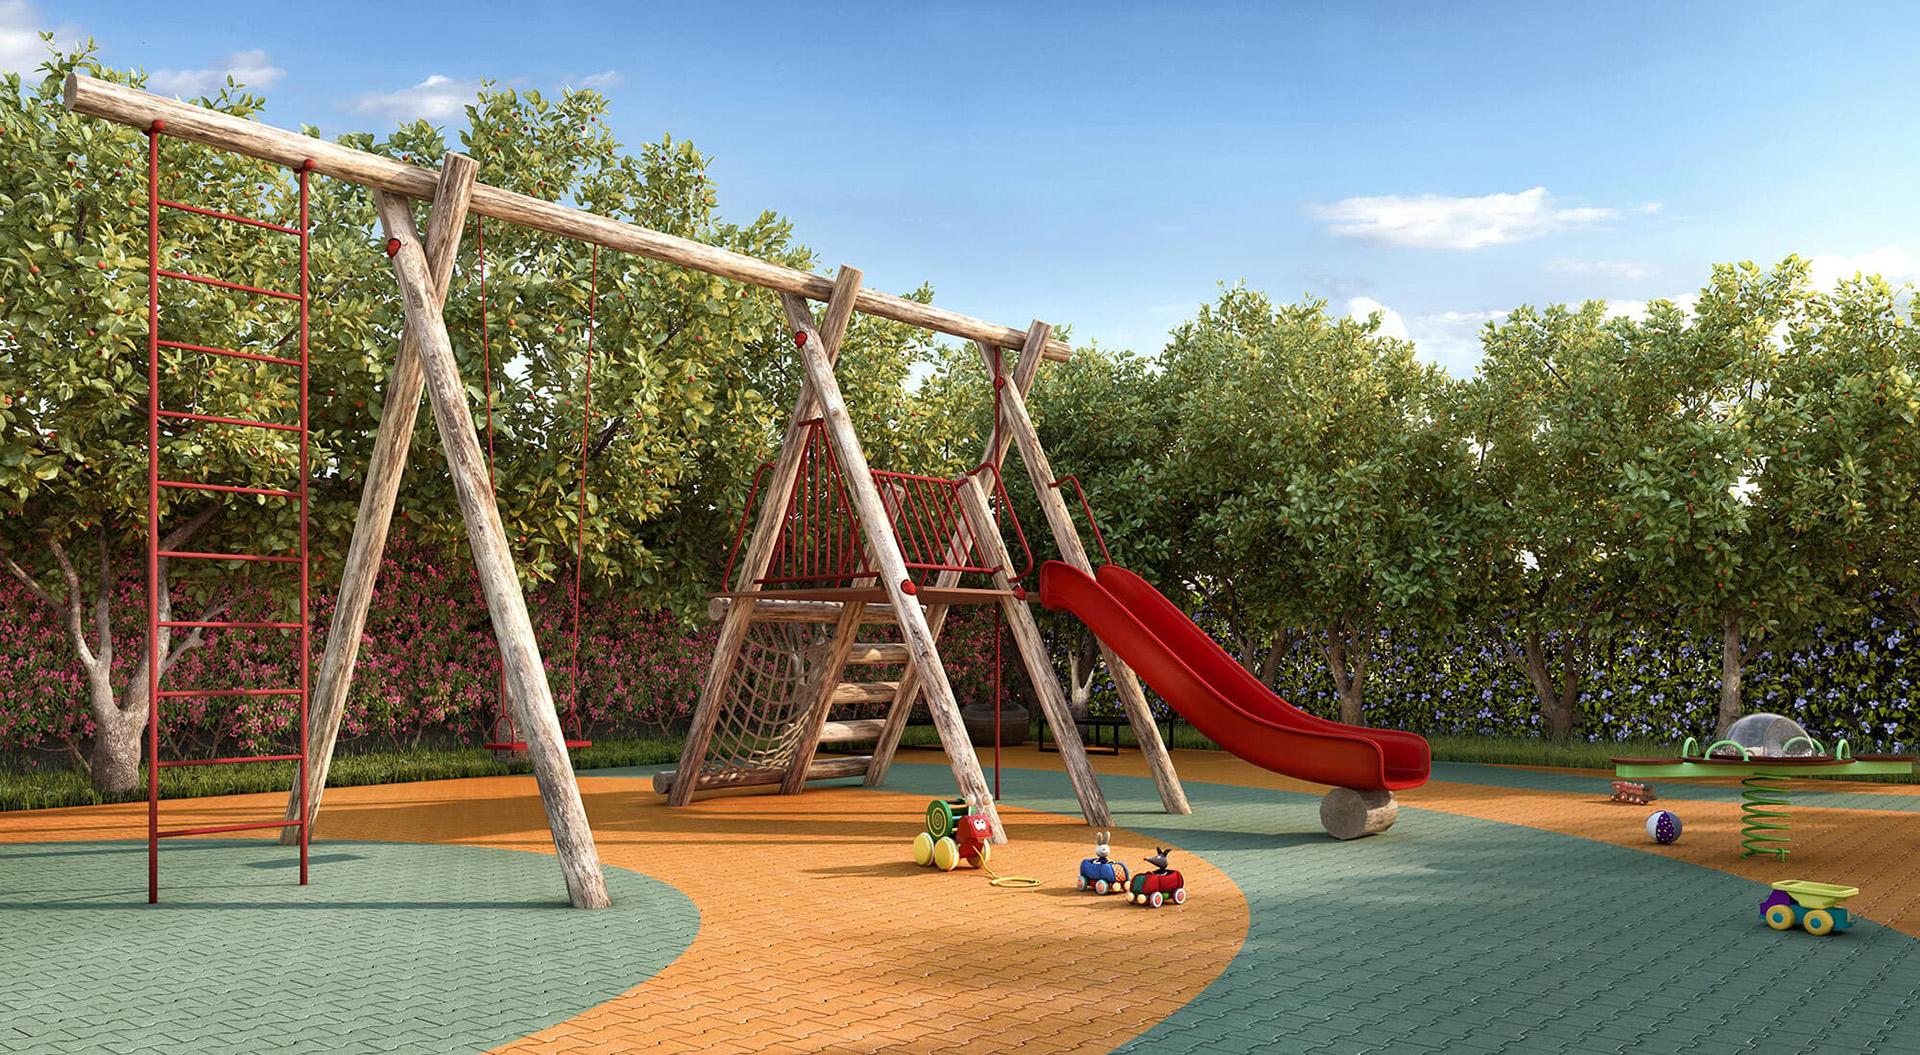 Perspectiva Ilustrada da Playground Atria Alphaville